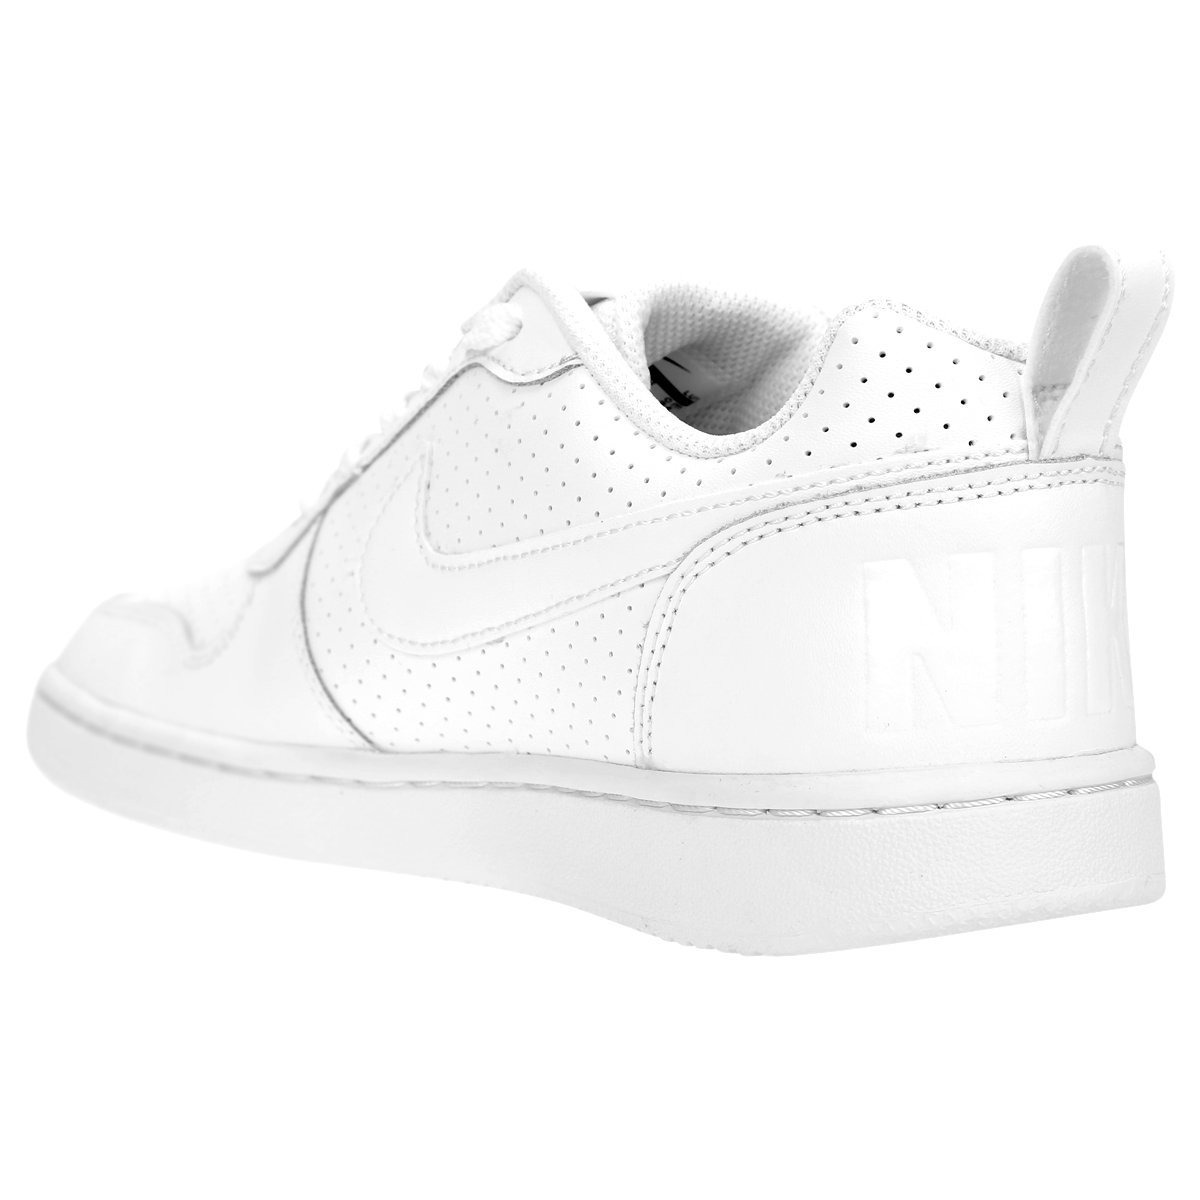 Zapatillas Nike 38 Low Recreation Blanco Talle mwN0vOPy8n